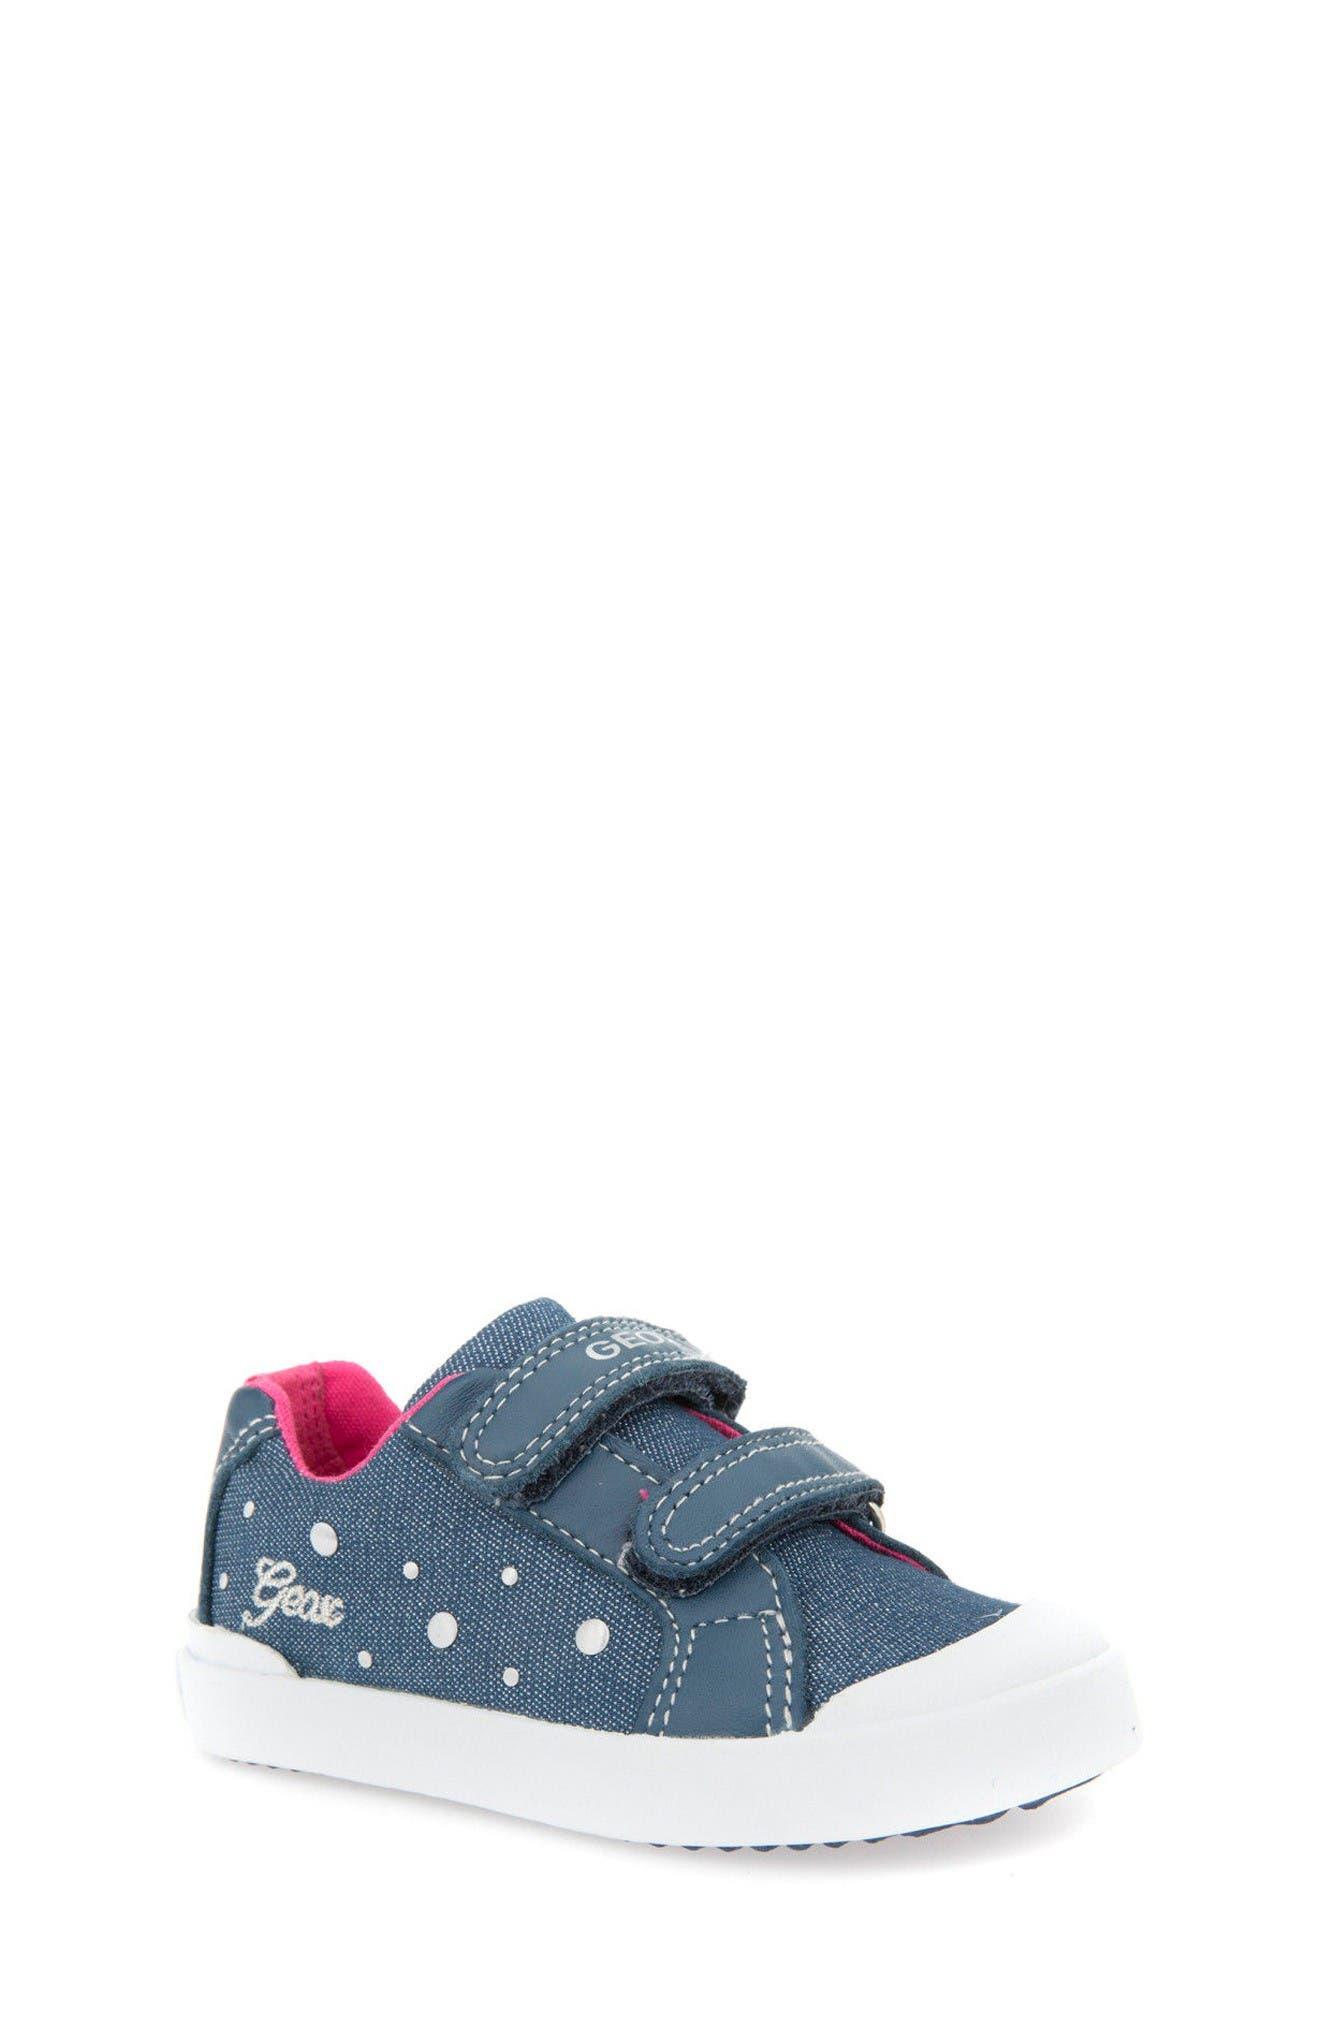 GEOX Kiwi Studded Sneaker